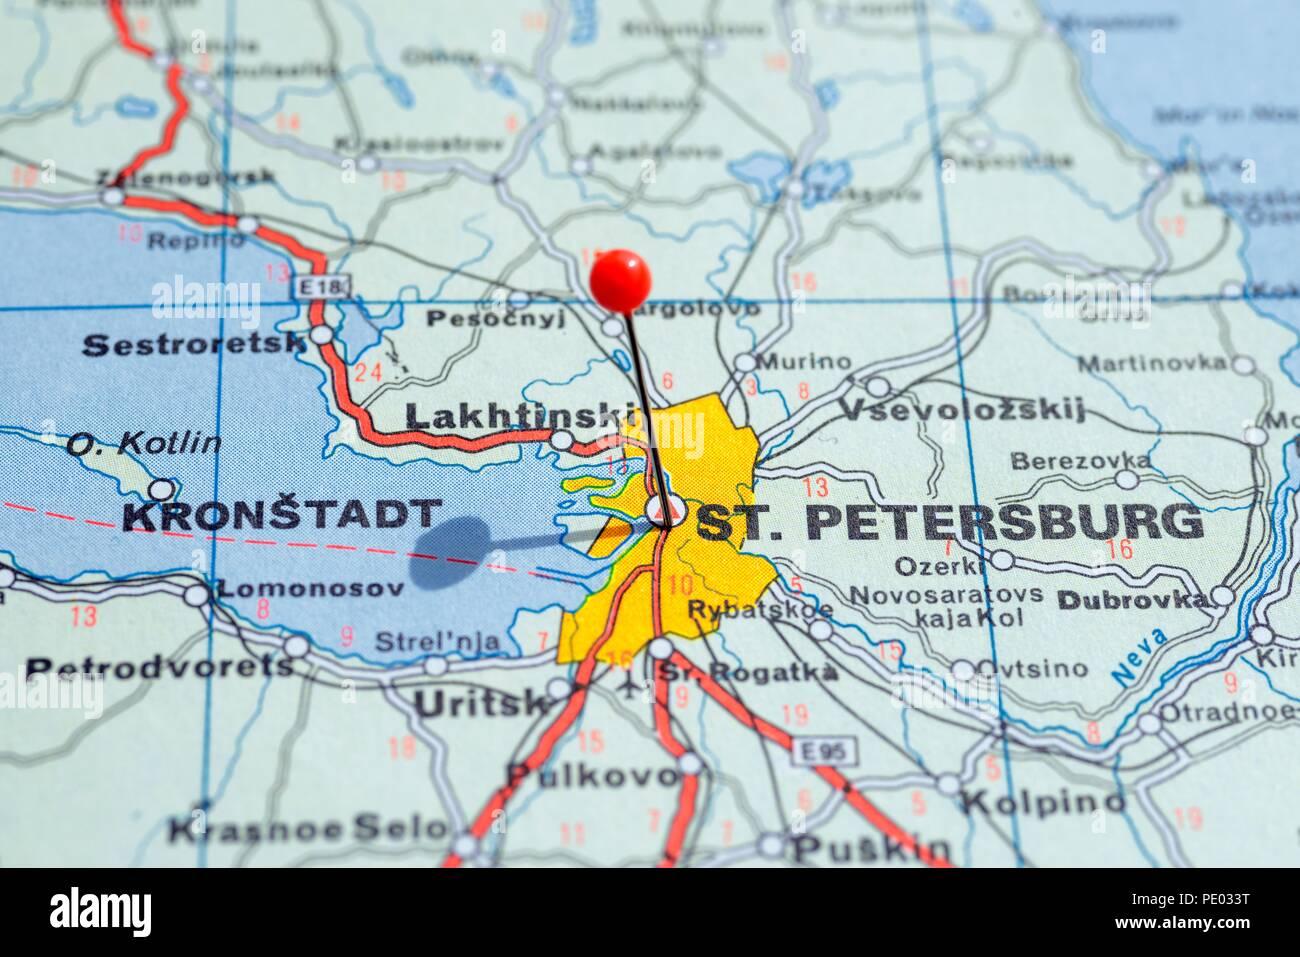 st petersburg map europe Sweden Stockholm, 07 April 2018: European cities on map series